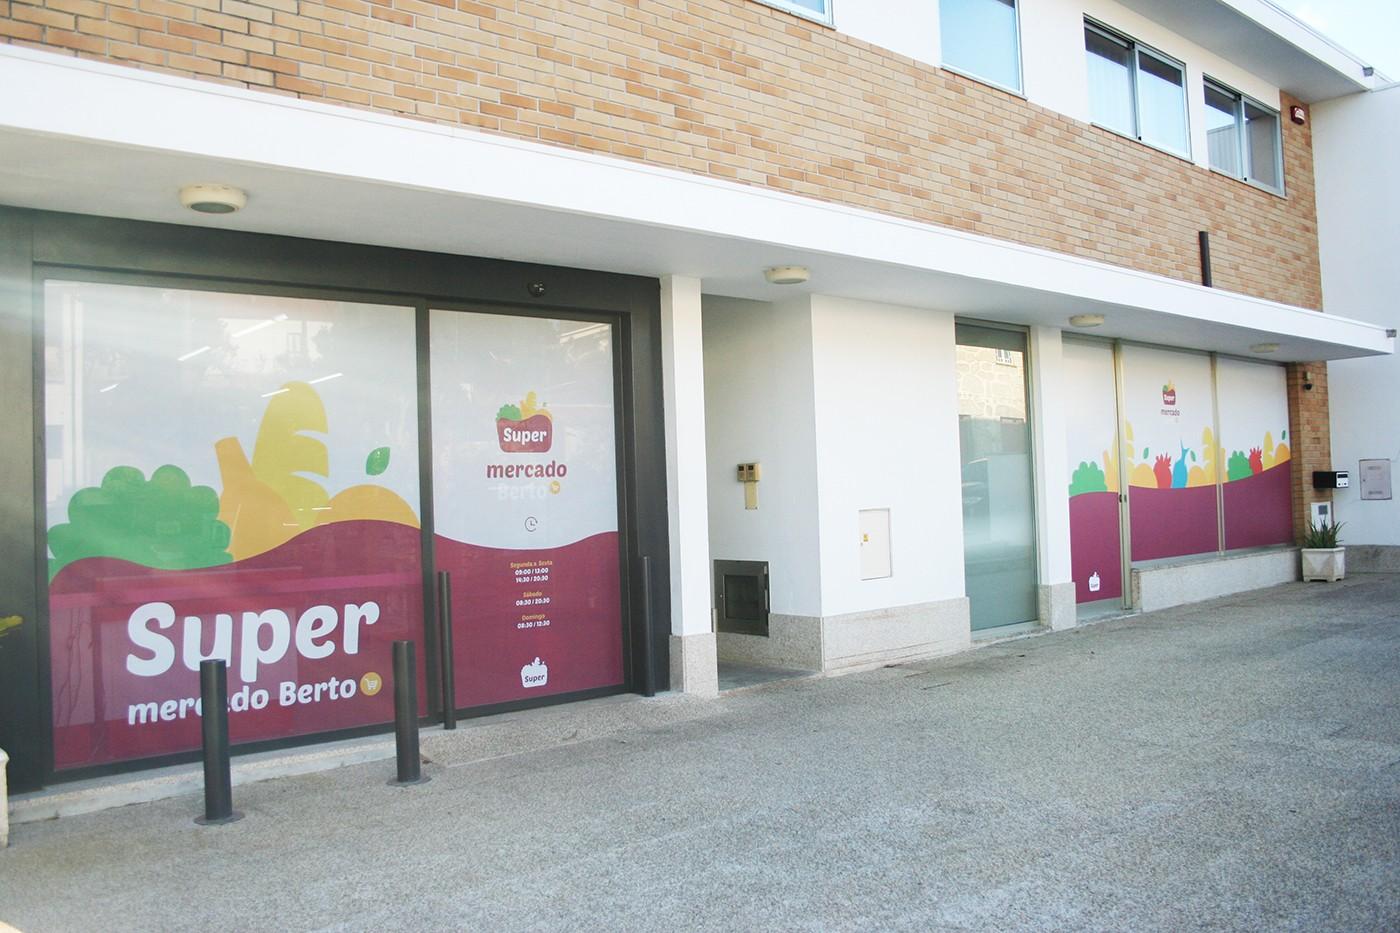 Supermercado Berto